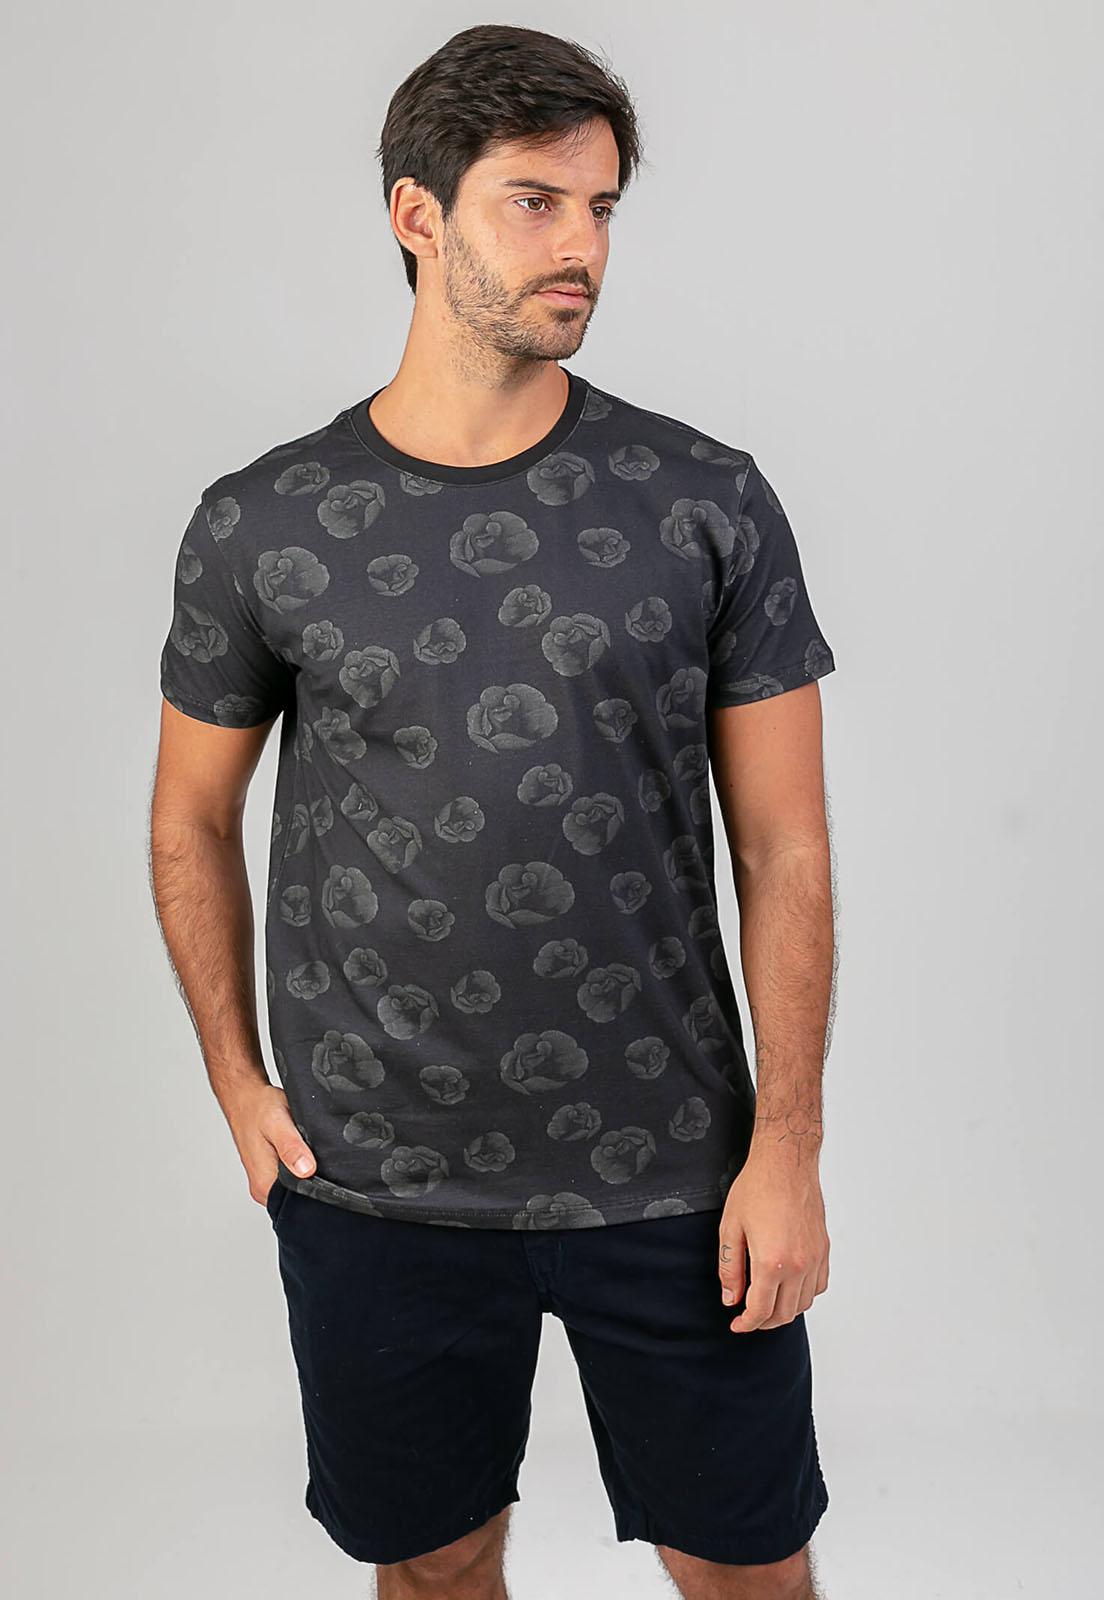 T-shirt Ventura  - melty surf & Co.